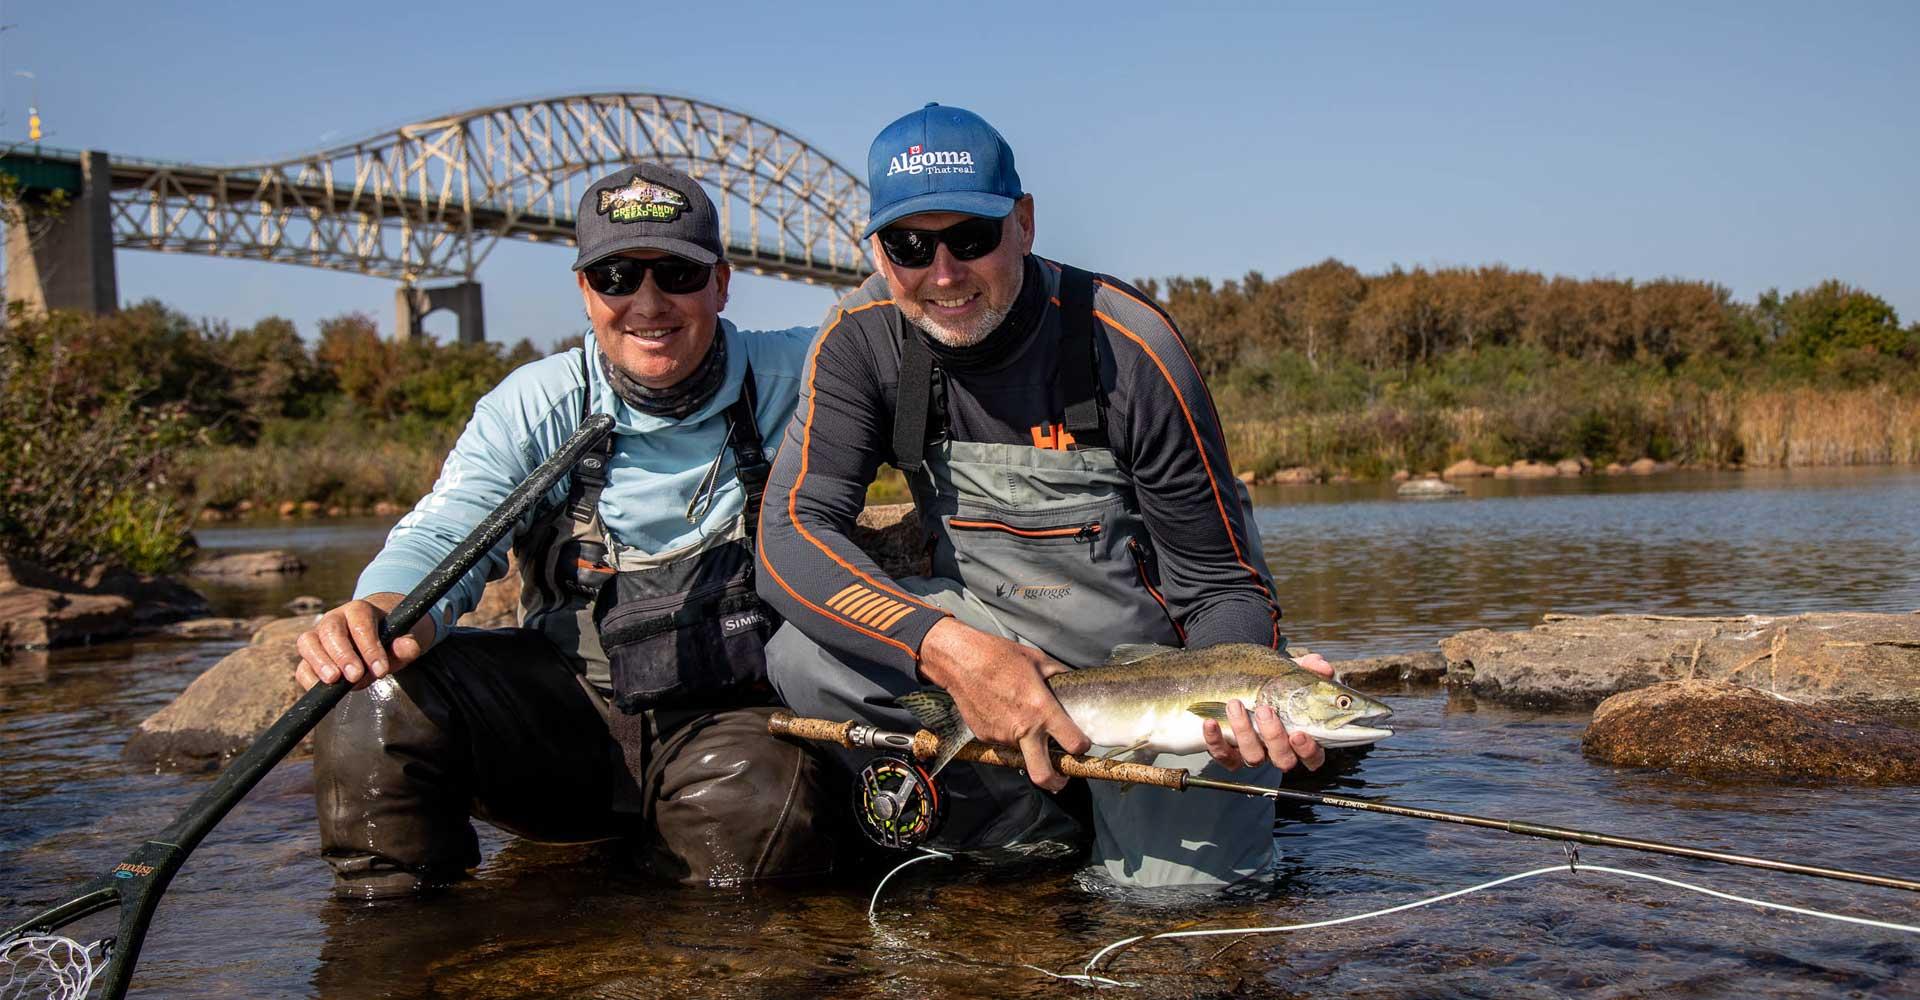 mlortz-fall-fly-fishing-ssm-rapids